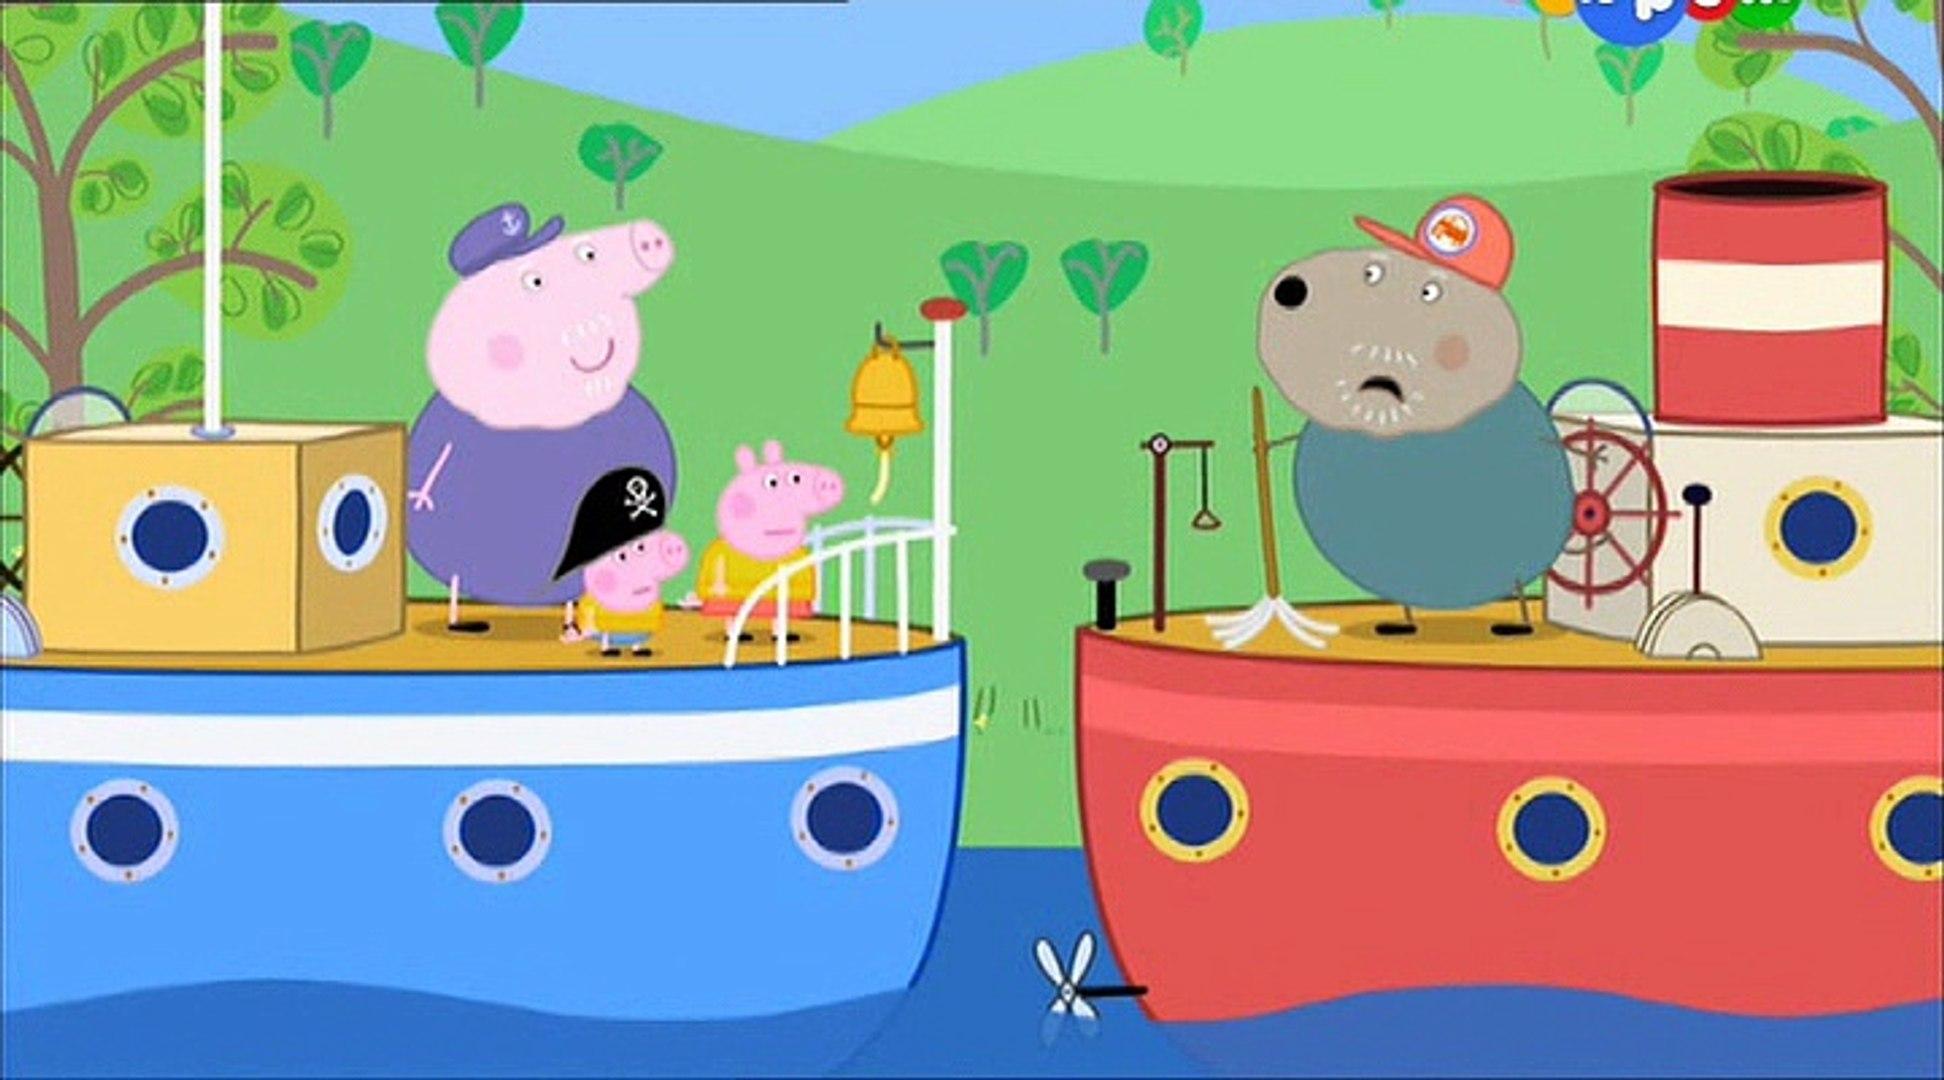 Свинка Пеппа- Речная прогулка Полли- Polly's Boat Trip -Все серии подряд Свинка Пеппа